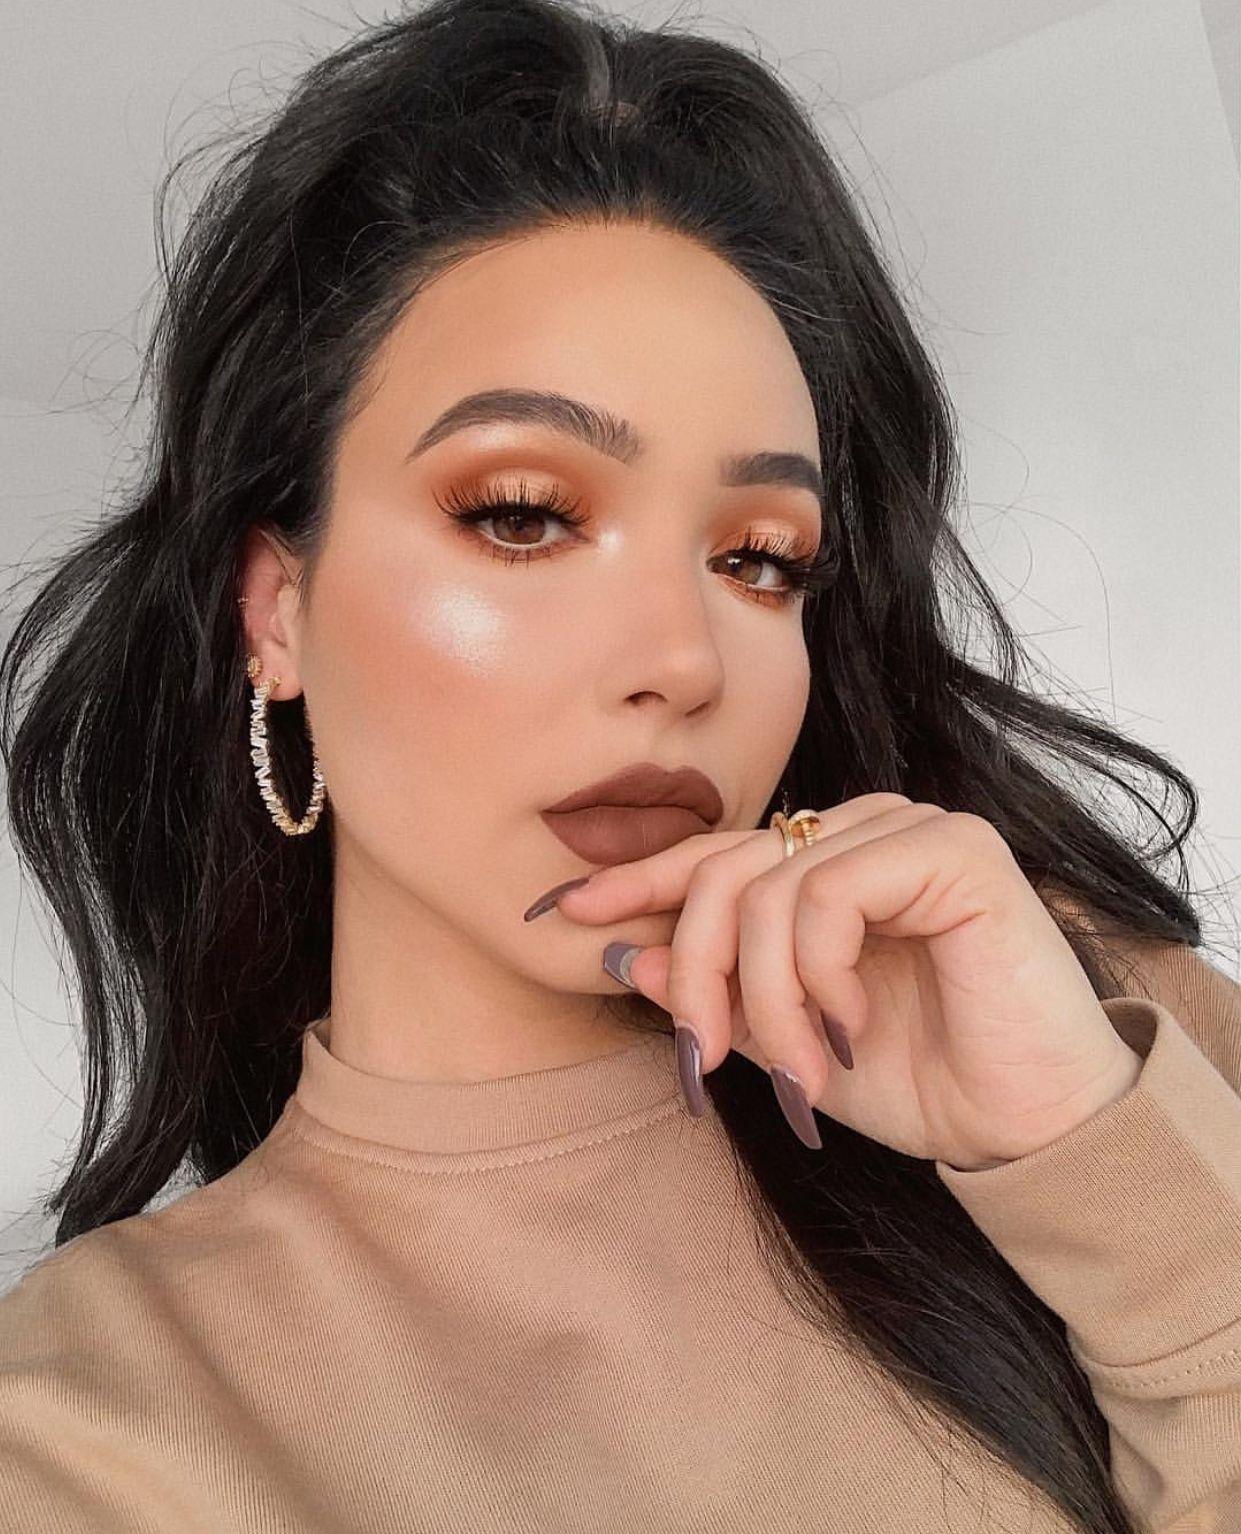 Instagramamandaensing Instagram makeup looks, Fall